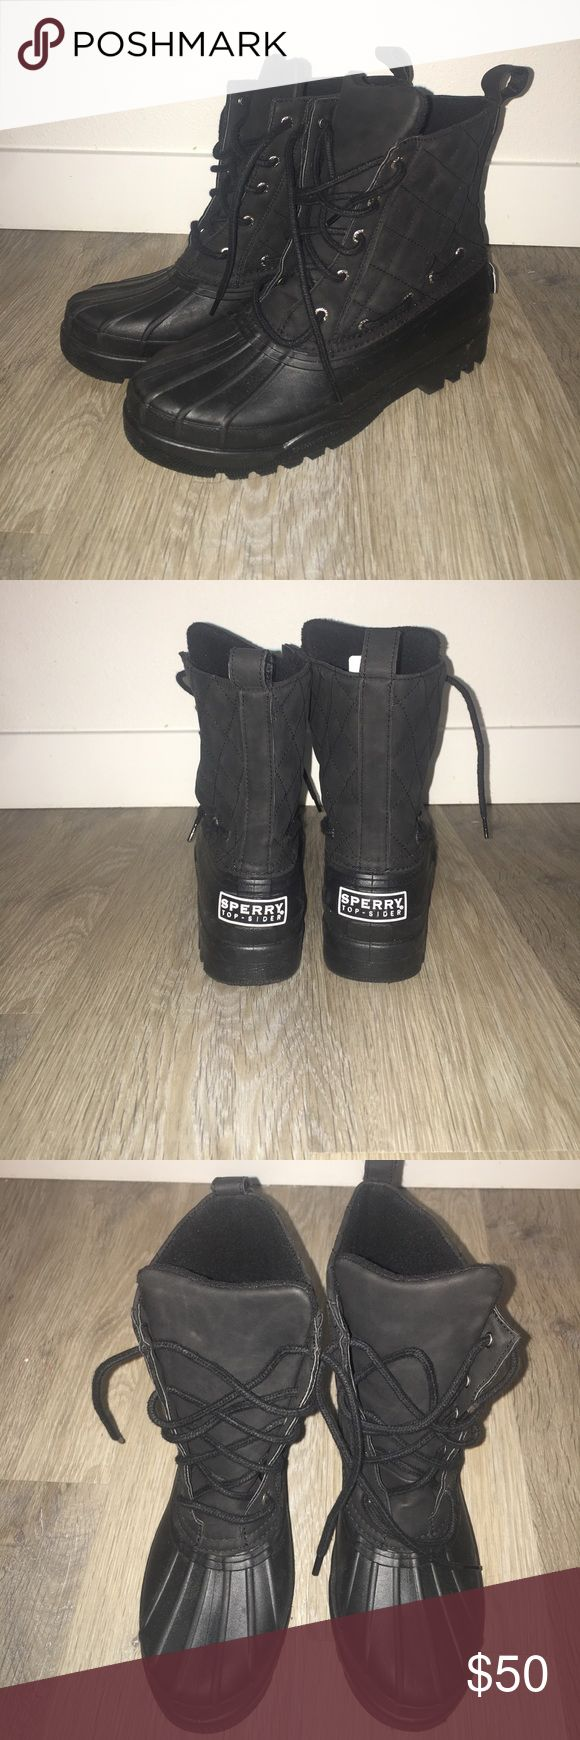 Sperry top sider rain/snow boots All black rain/snow boots. Hard rubber sole w/fleece inside. Sperry Top-Sider Shoes Winter & Rain Boots